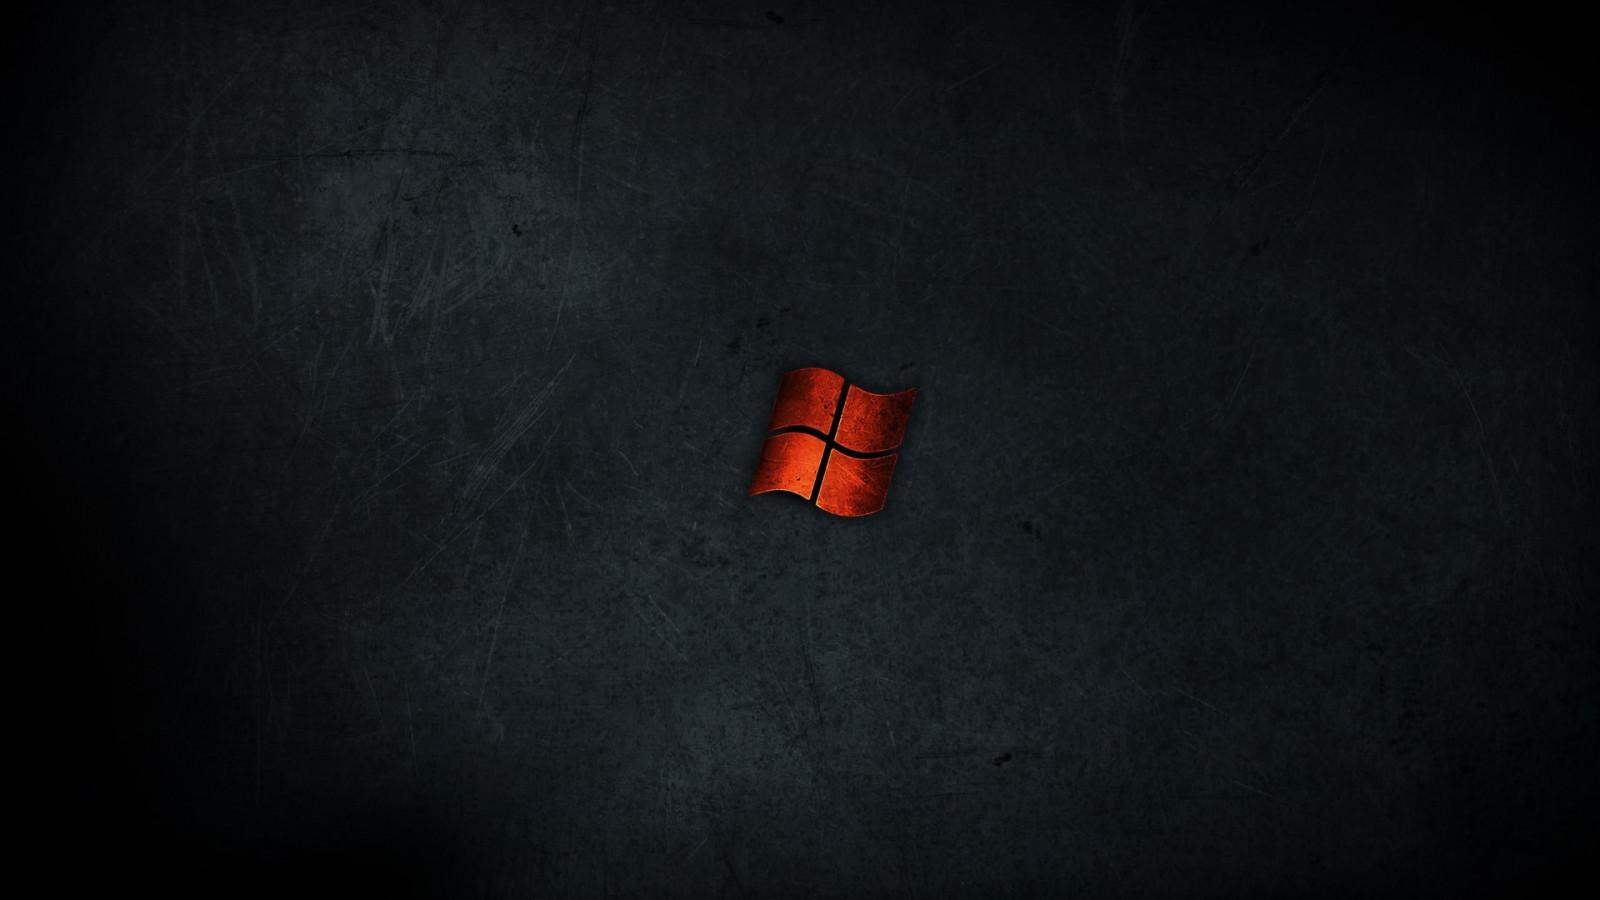 fond d 39 cran noir rouge texte logo microsoft windows lumi re forme ligne obscurit. Black Bedroom Furniture Sets. Home Design Ideas